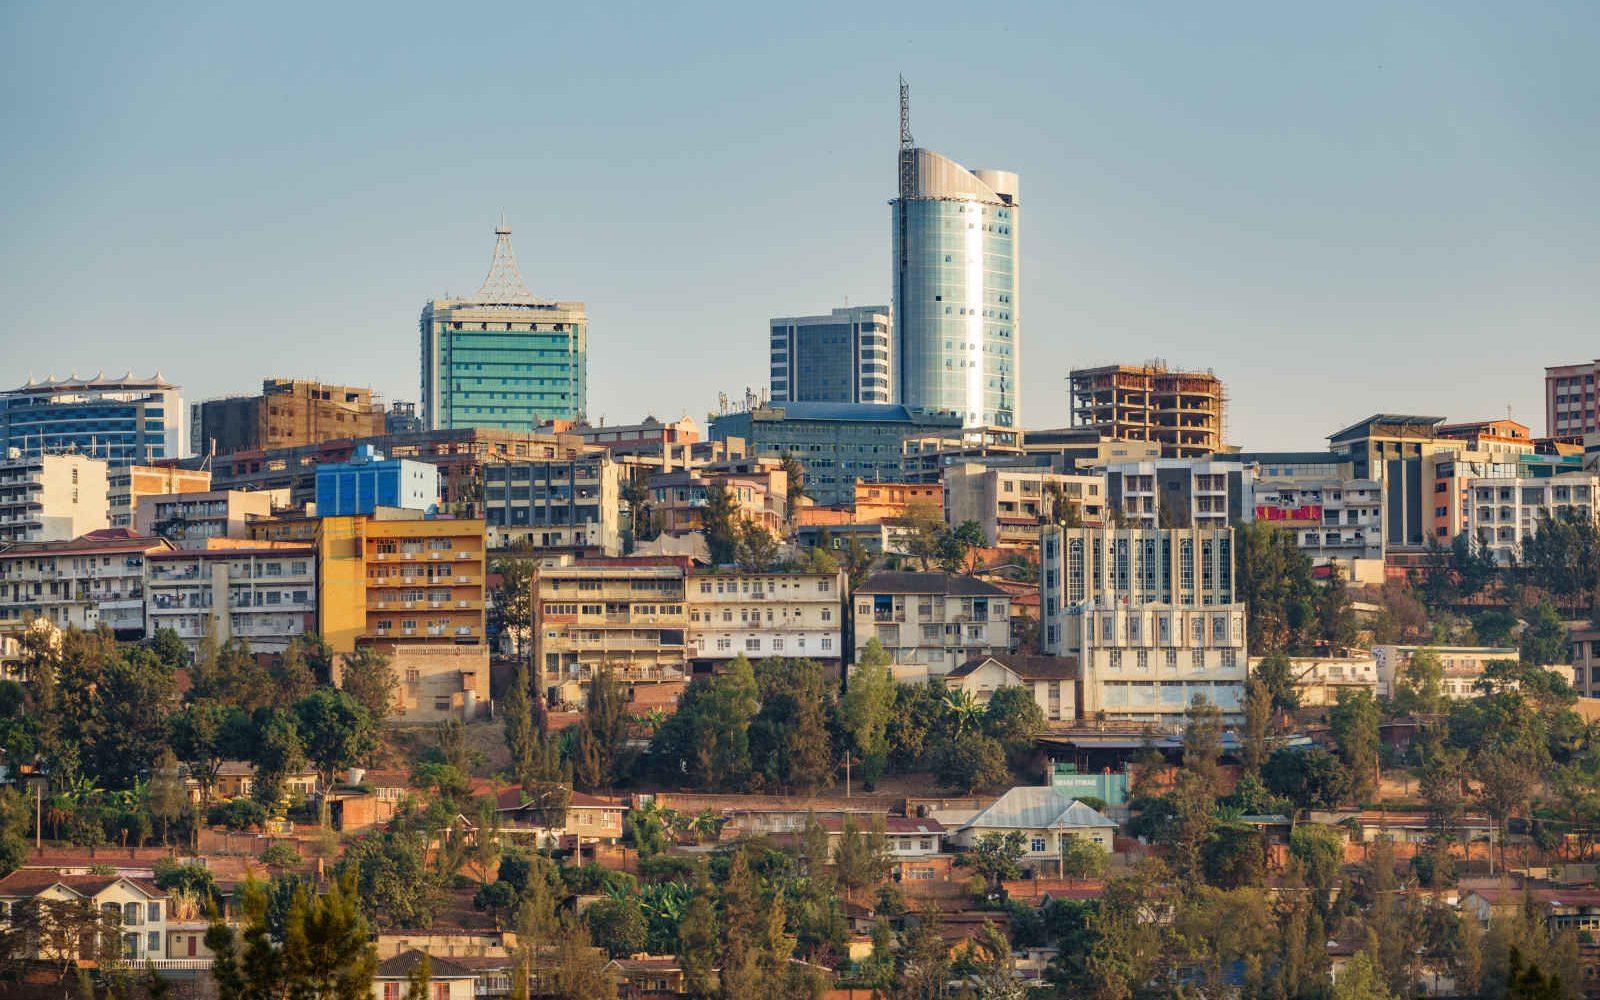 Skyline, Kigali, Rwanda